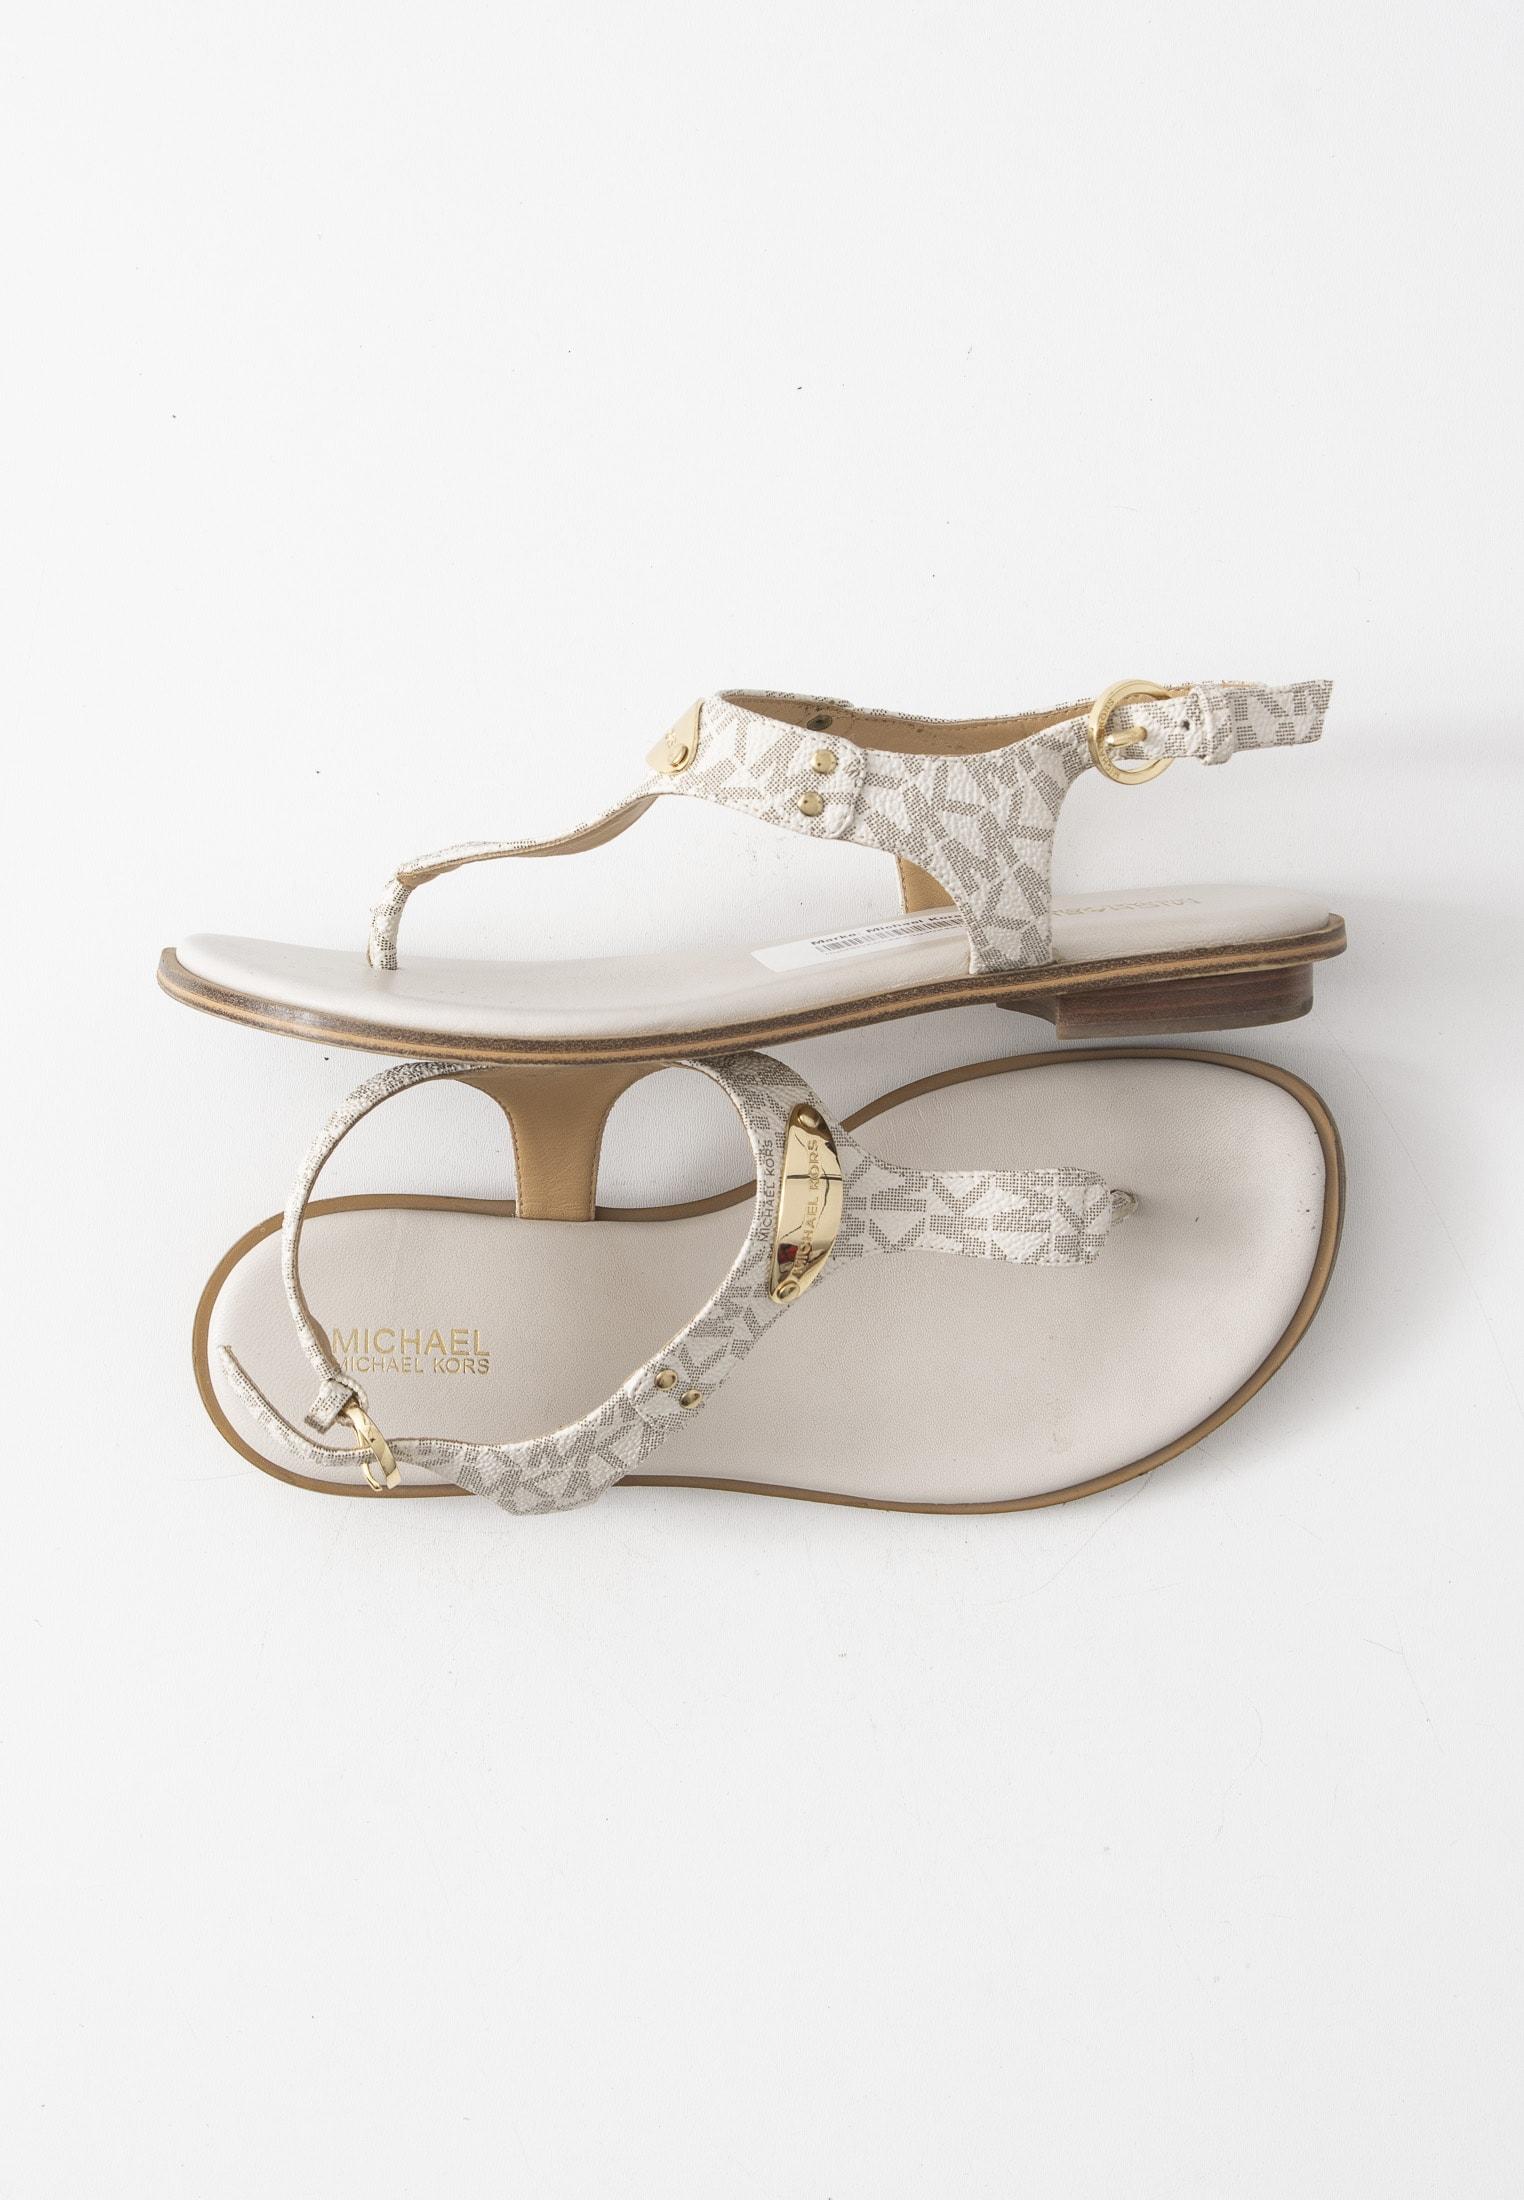 Michael Kors Collection Sandale Weiß Gr.37